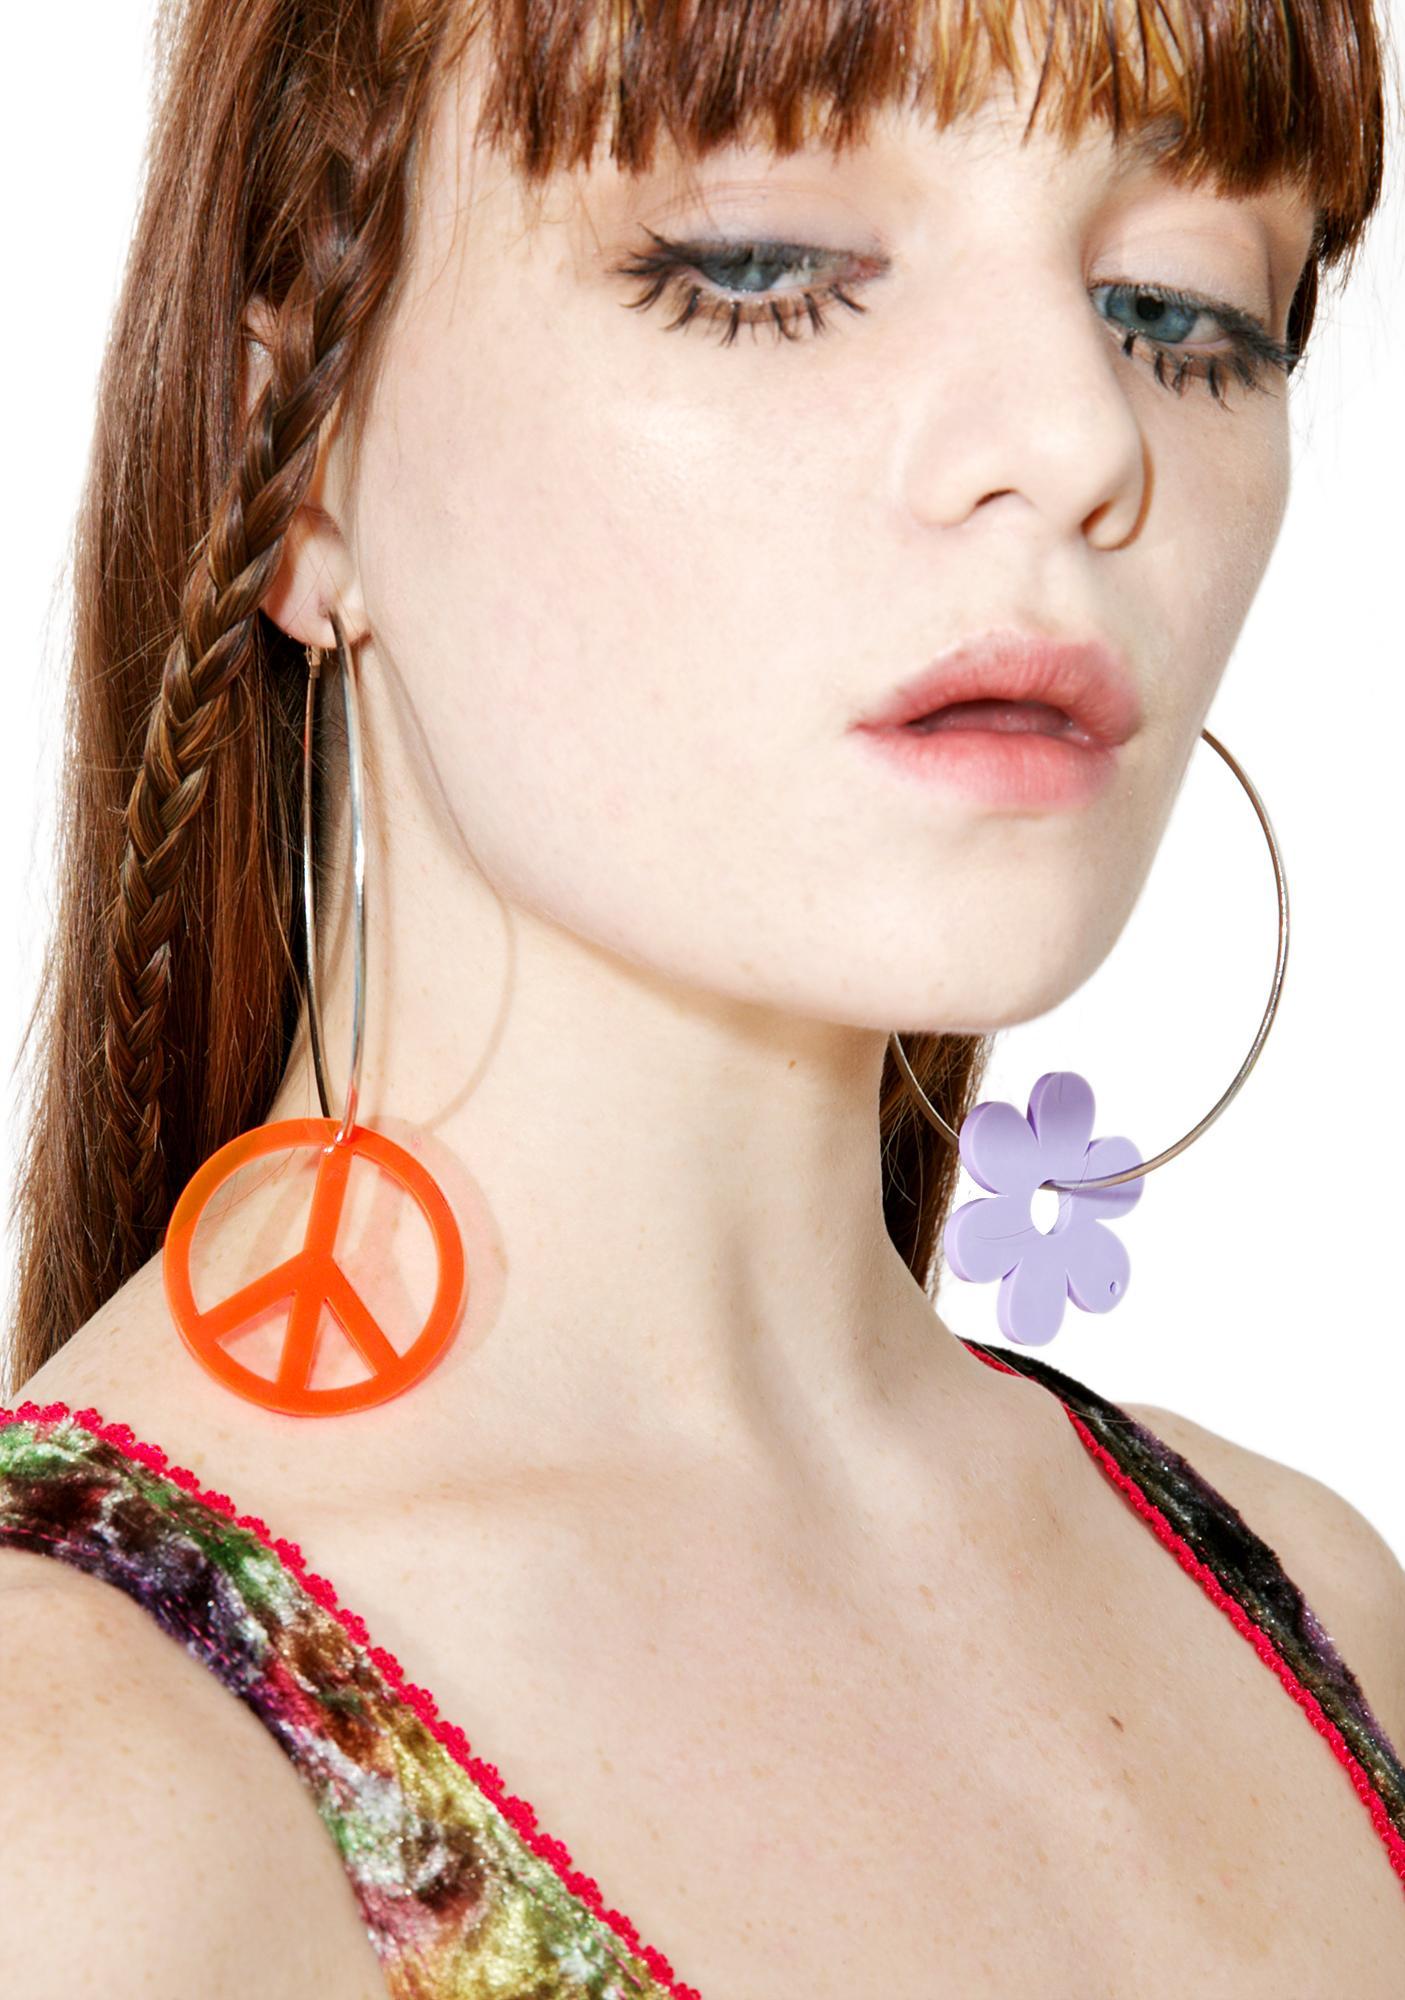 Suzywan Deluxe Peace Sign N' Daisy Silver Hoops